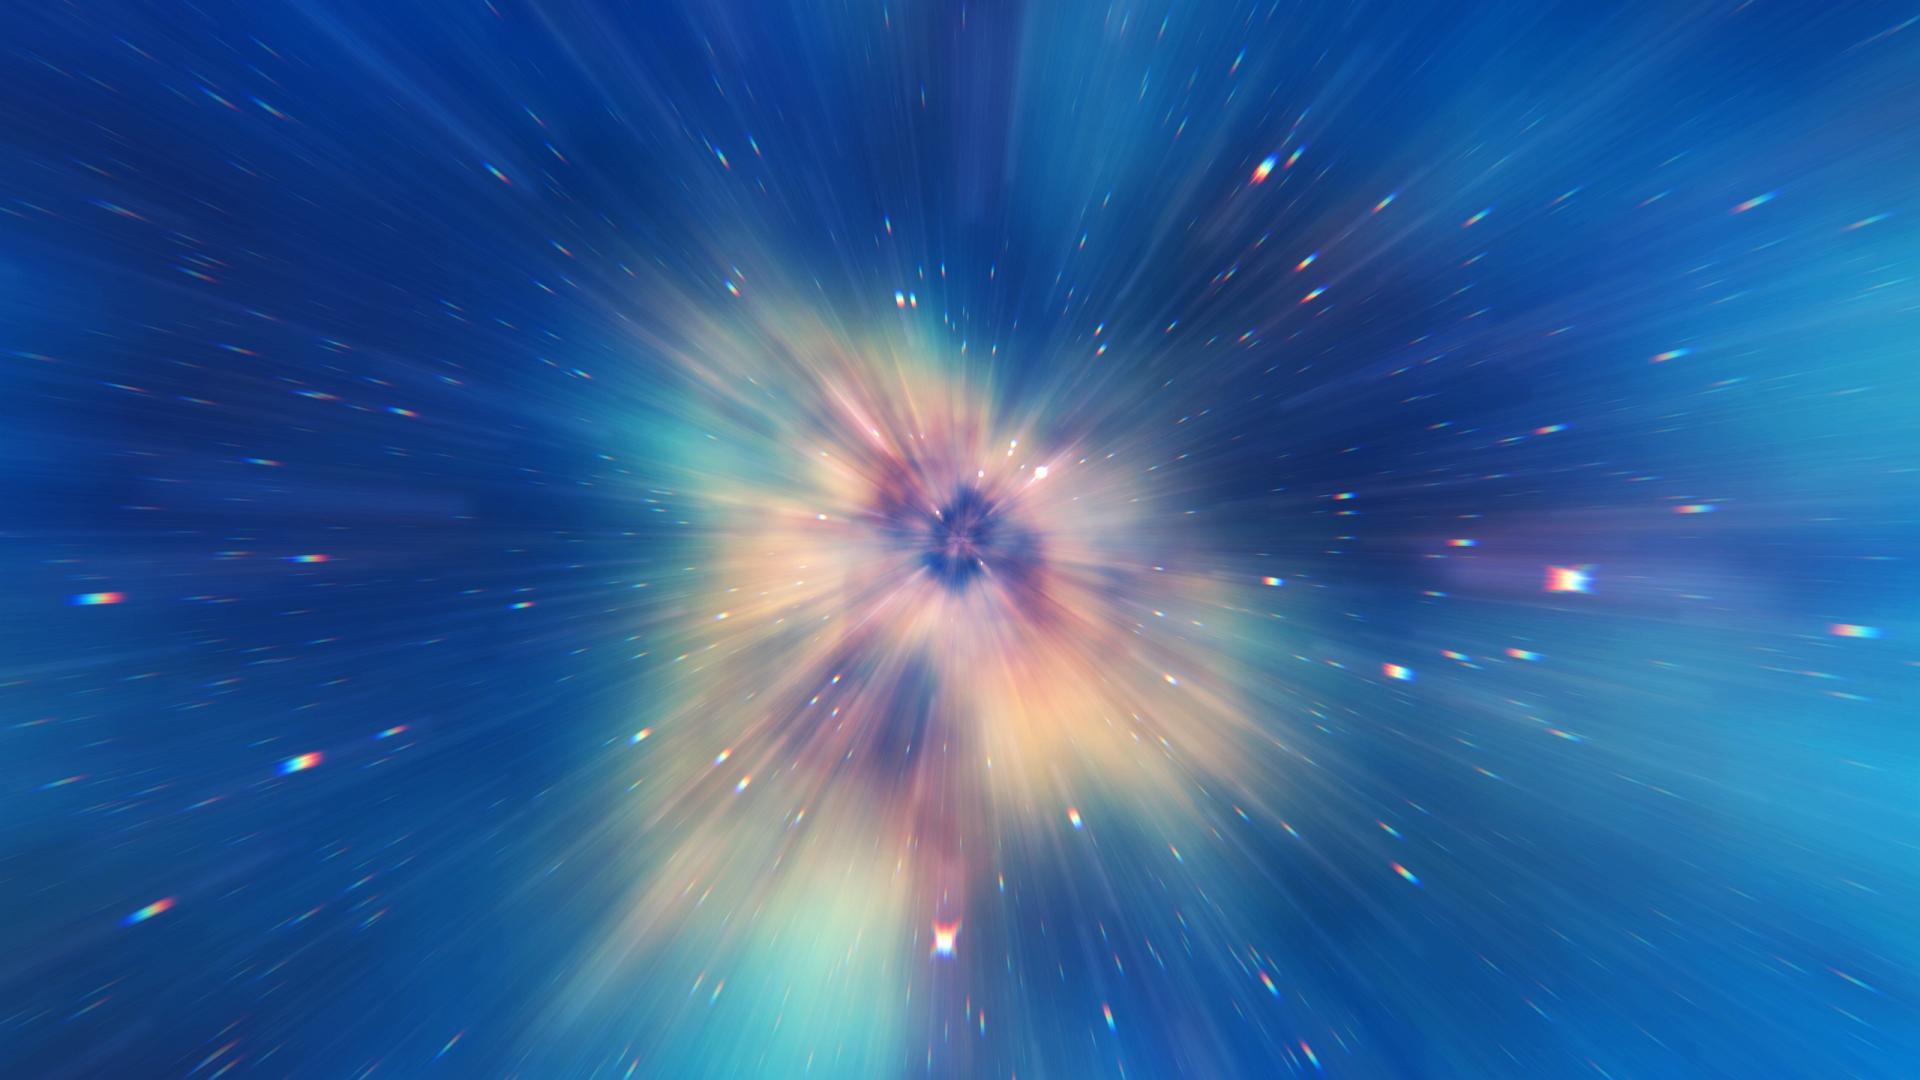 Wallpaper Speed Of Light - 1920 x 1080 - Planets Stars Galaxies ...